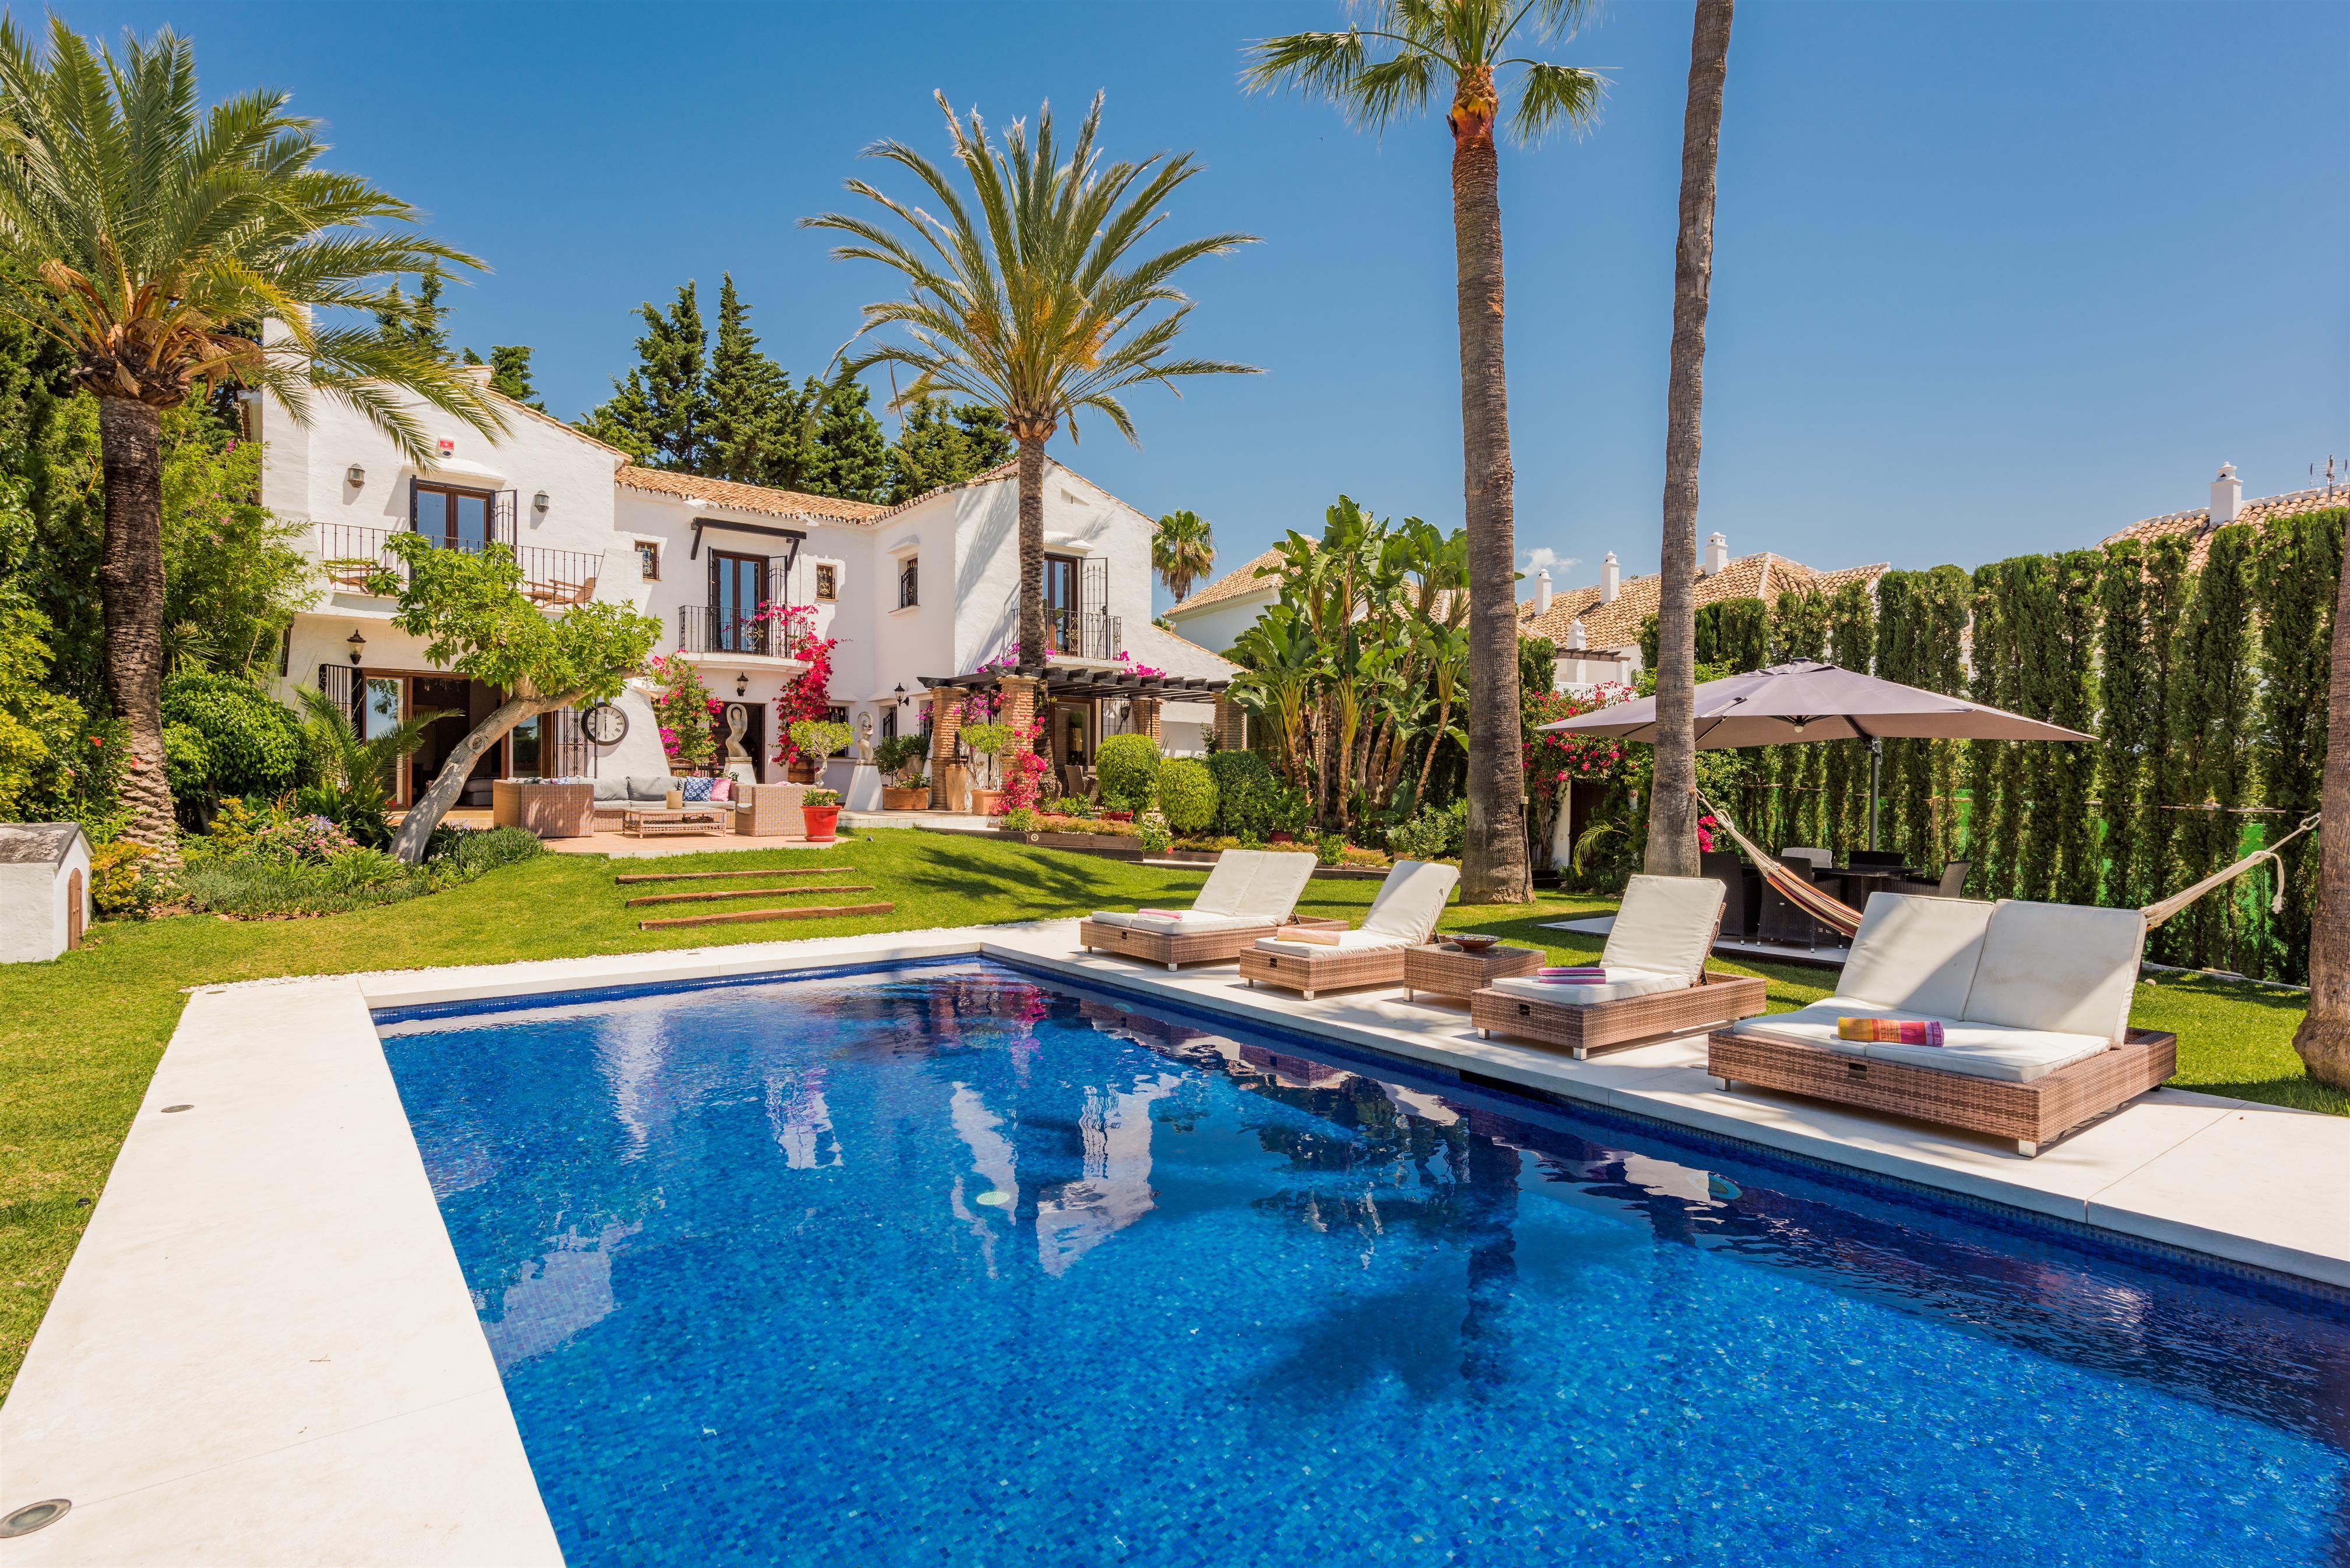 Marbella's economic growth forecast upgraded